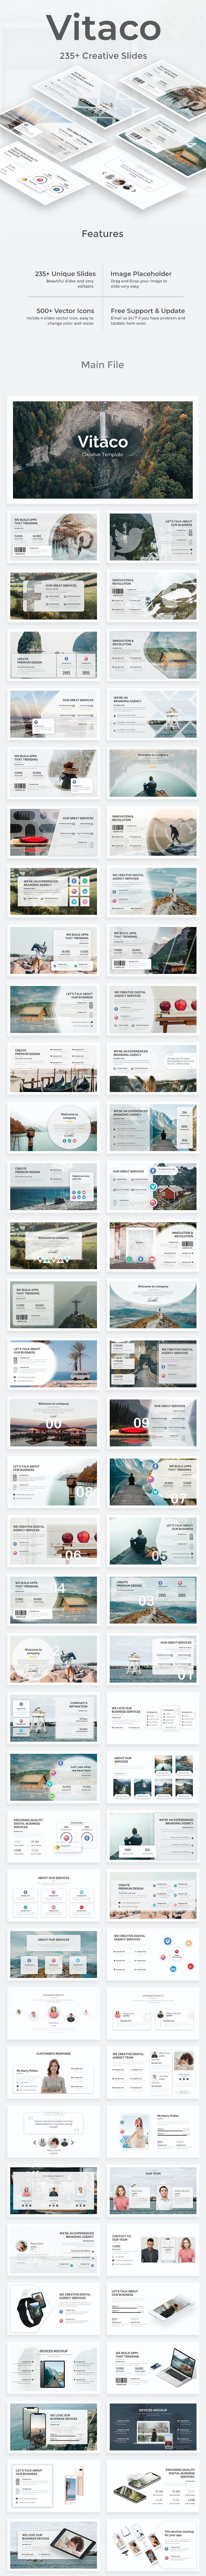 Vitaco Premium Google Slide Template - Google Slides Presentation Templates